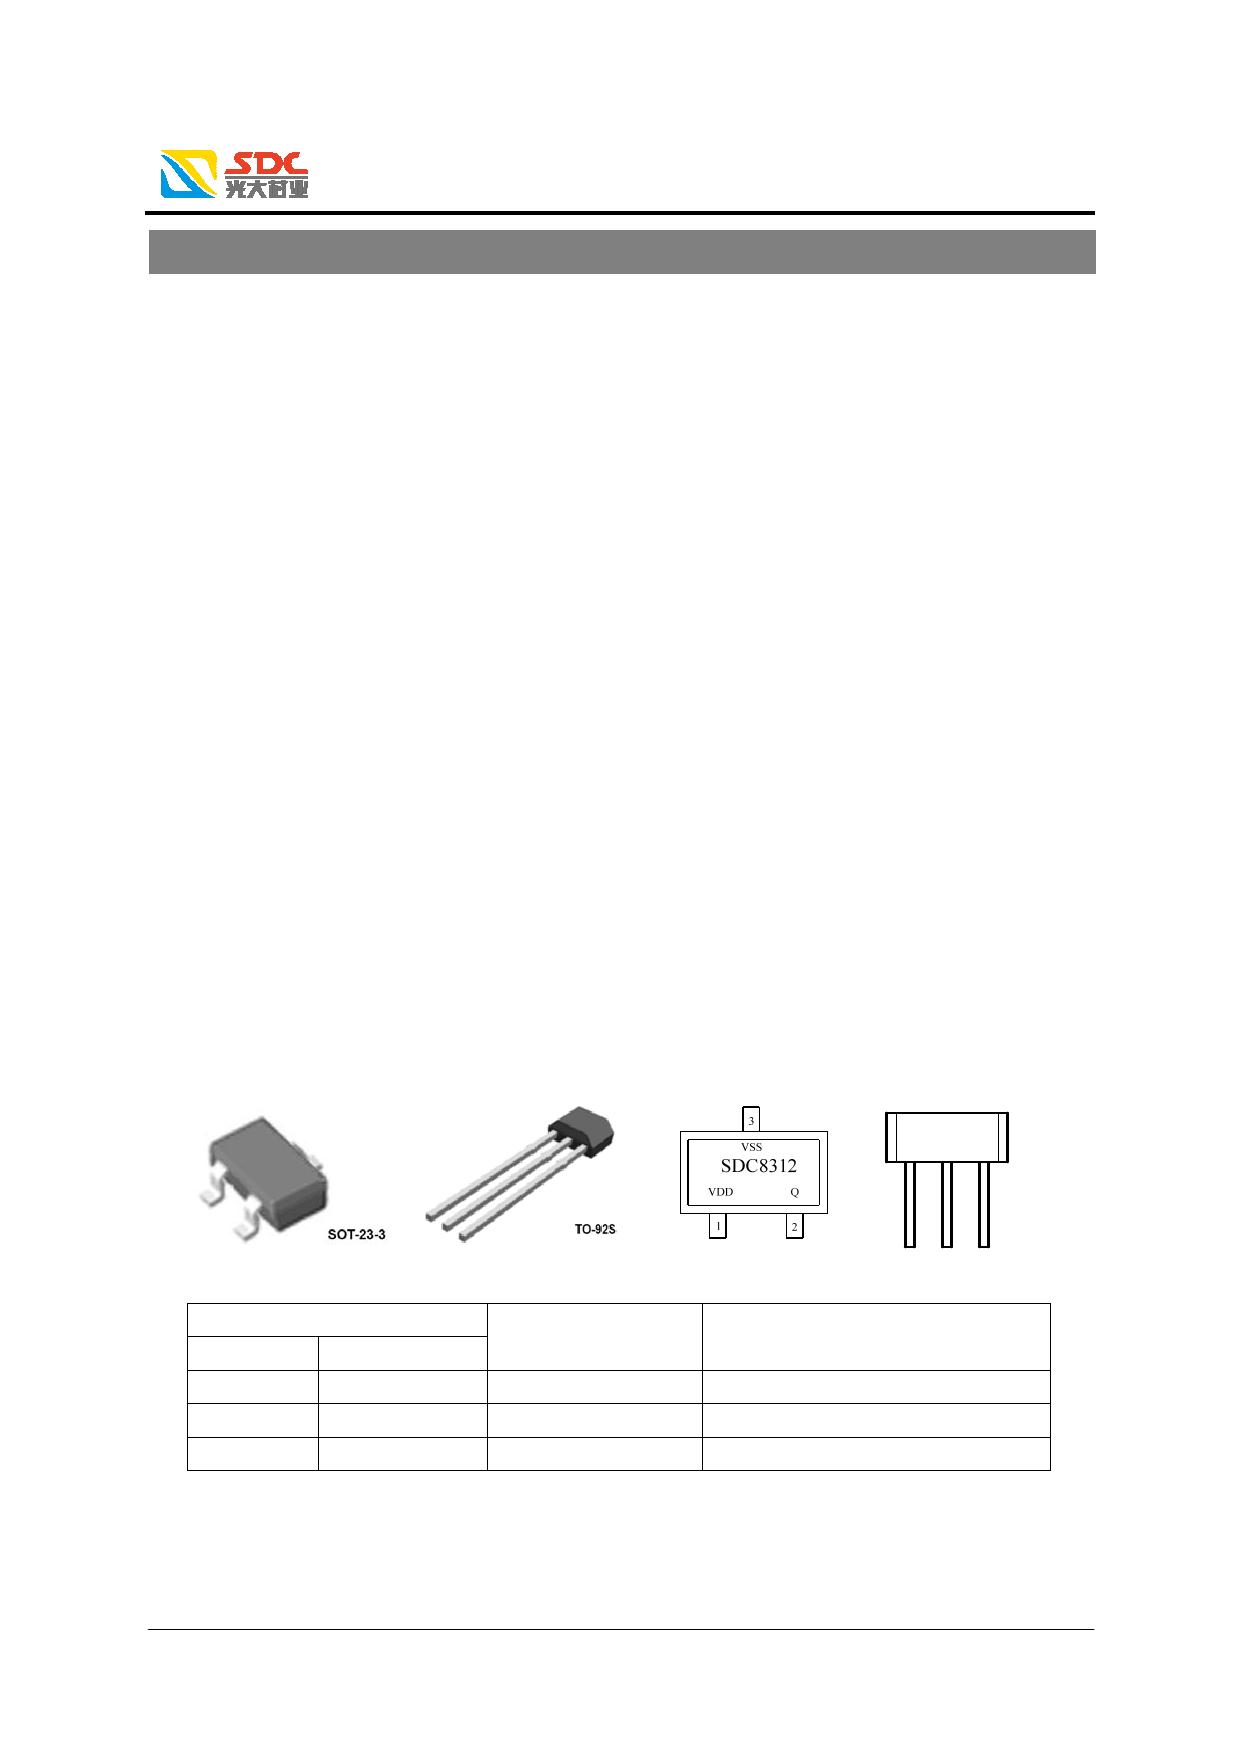 newnes microprocessor pocket book